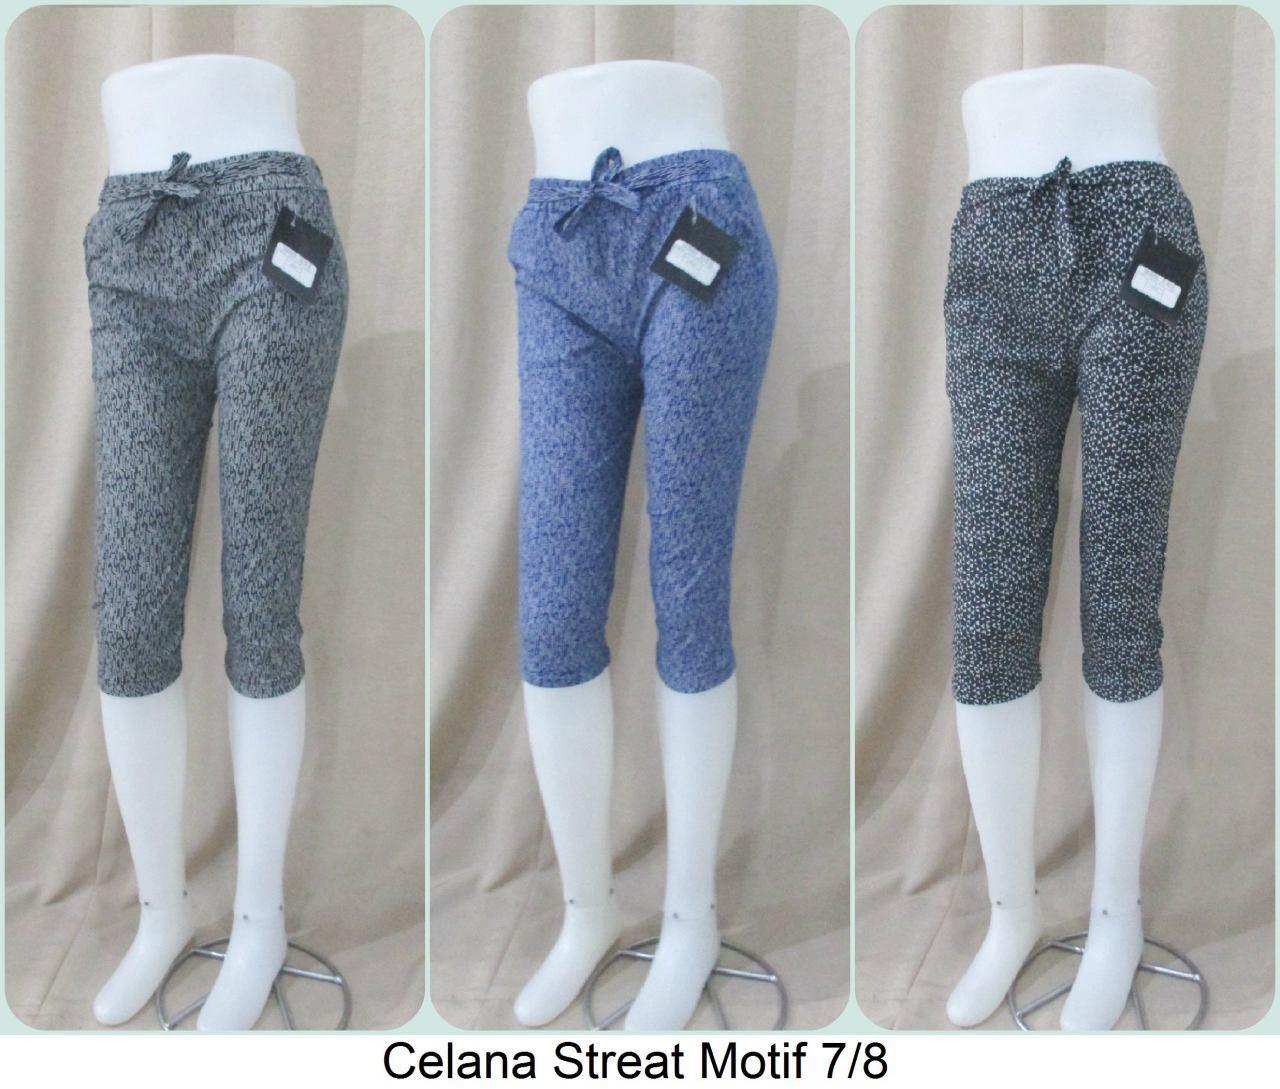 ObralanBaju.com Celana Stretch Motif 7/8